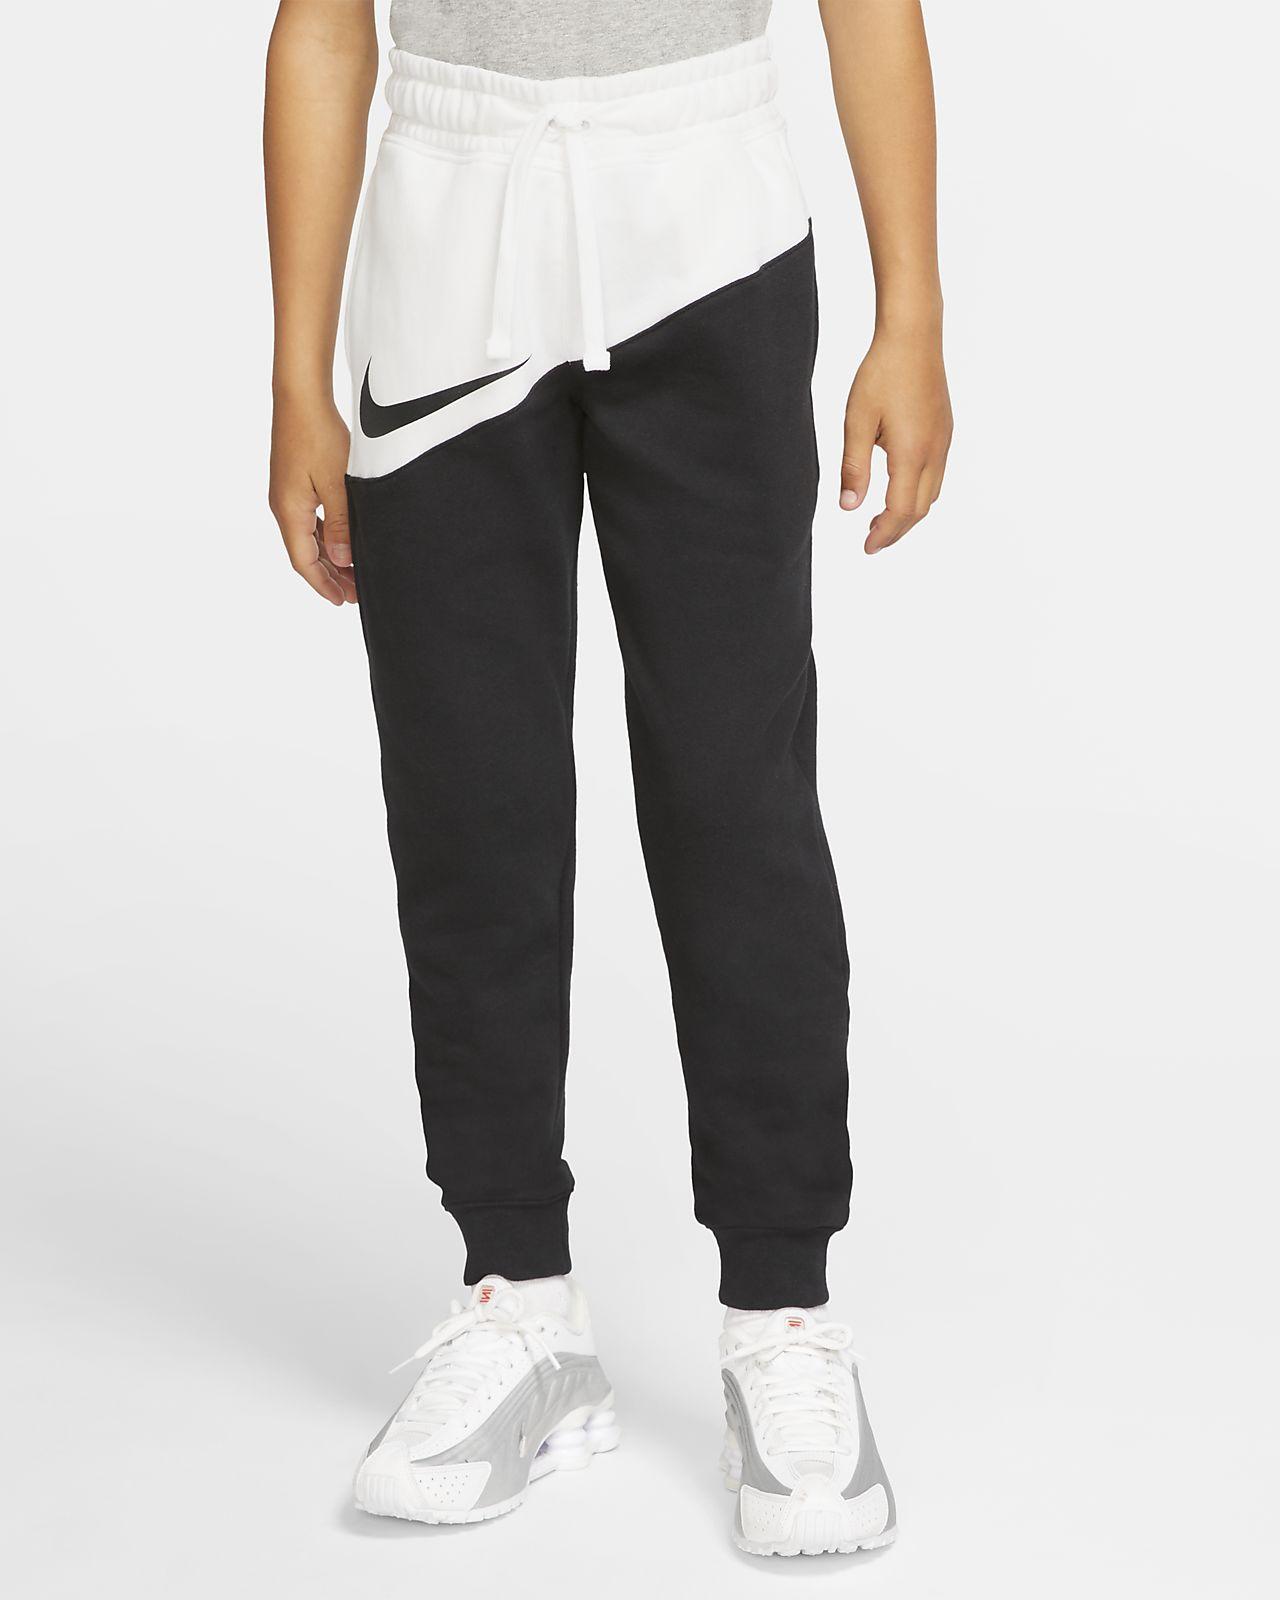 Nike Sportswear 男童 Swoosh 運動褲